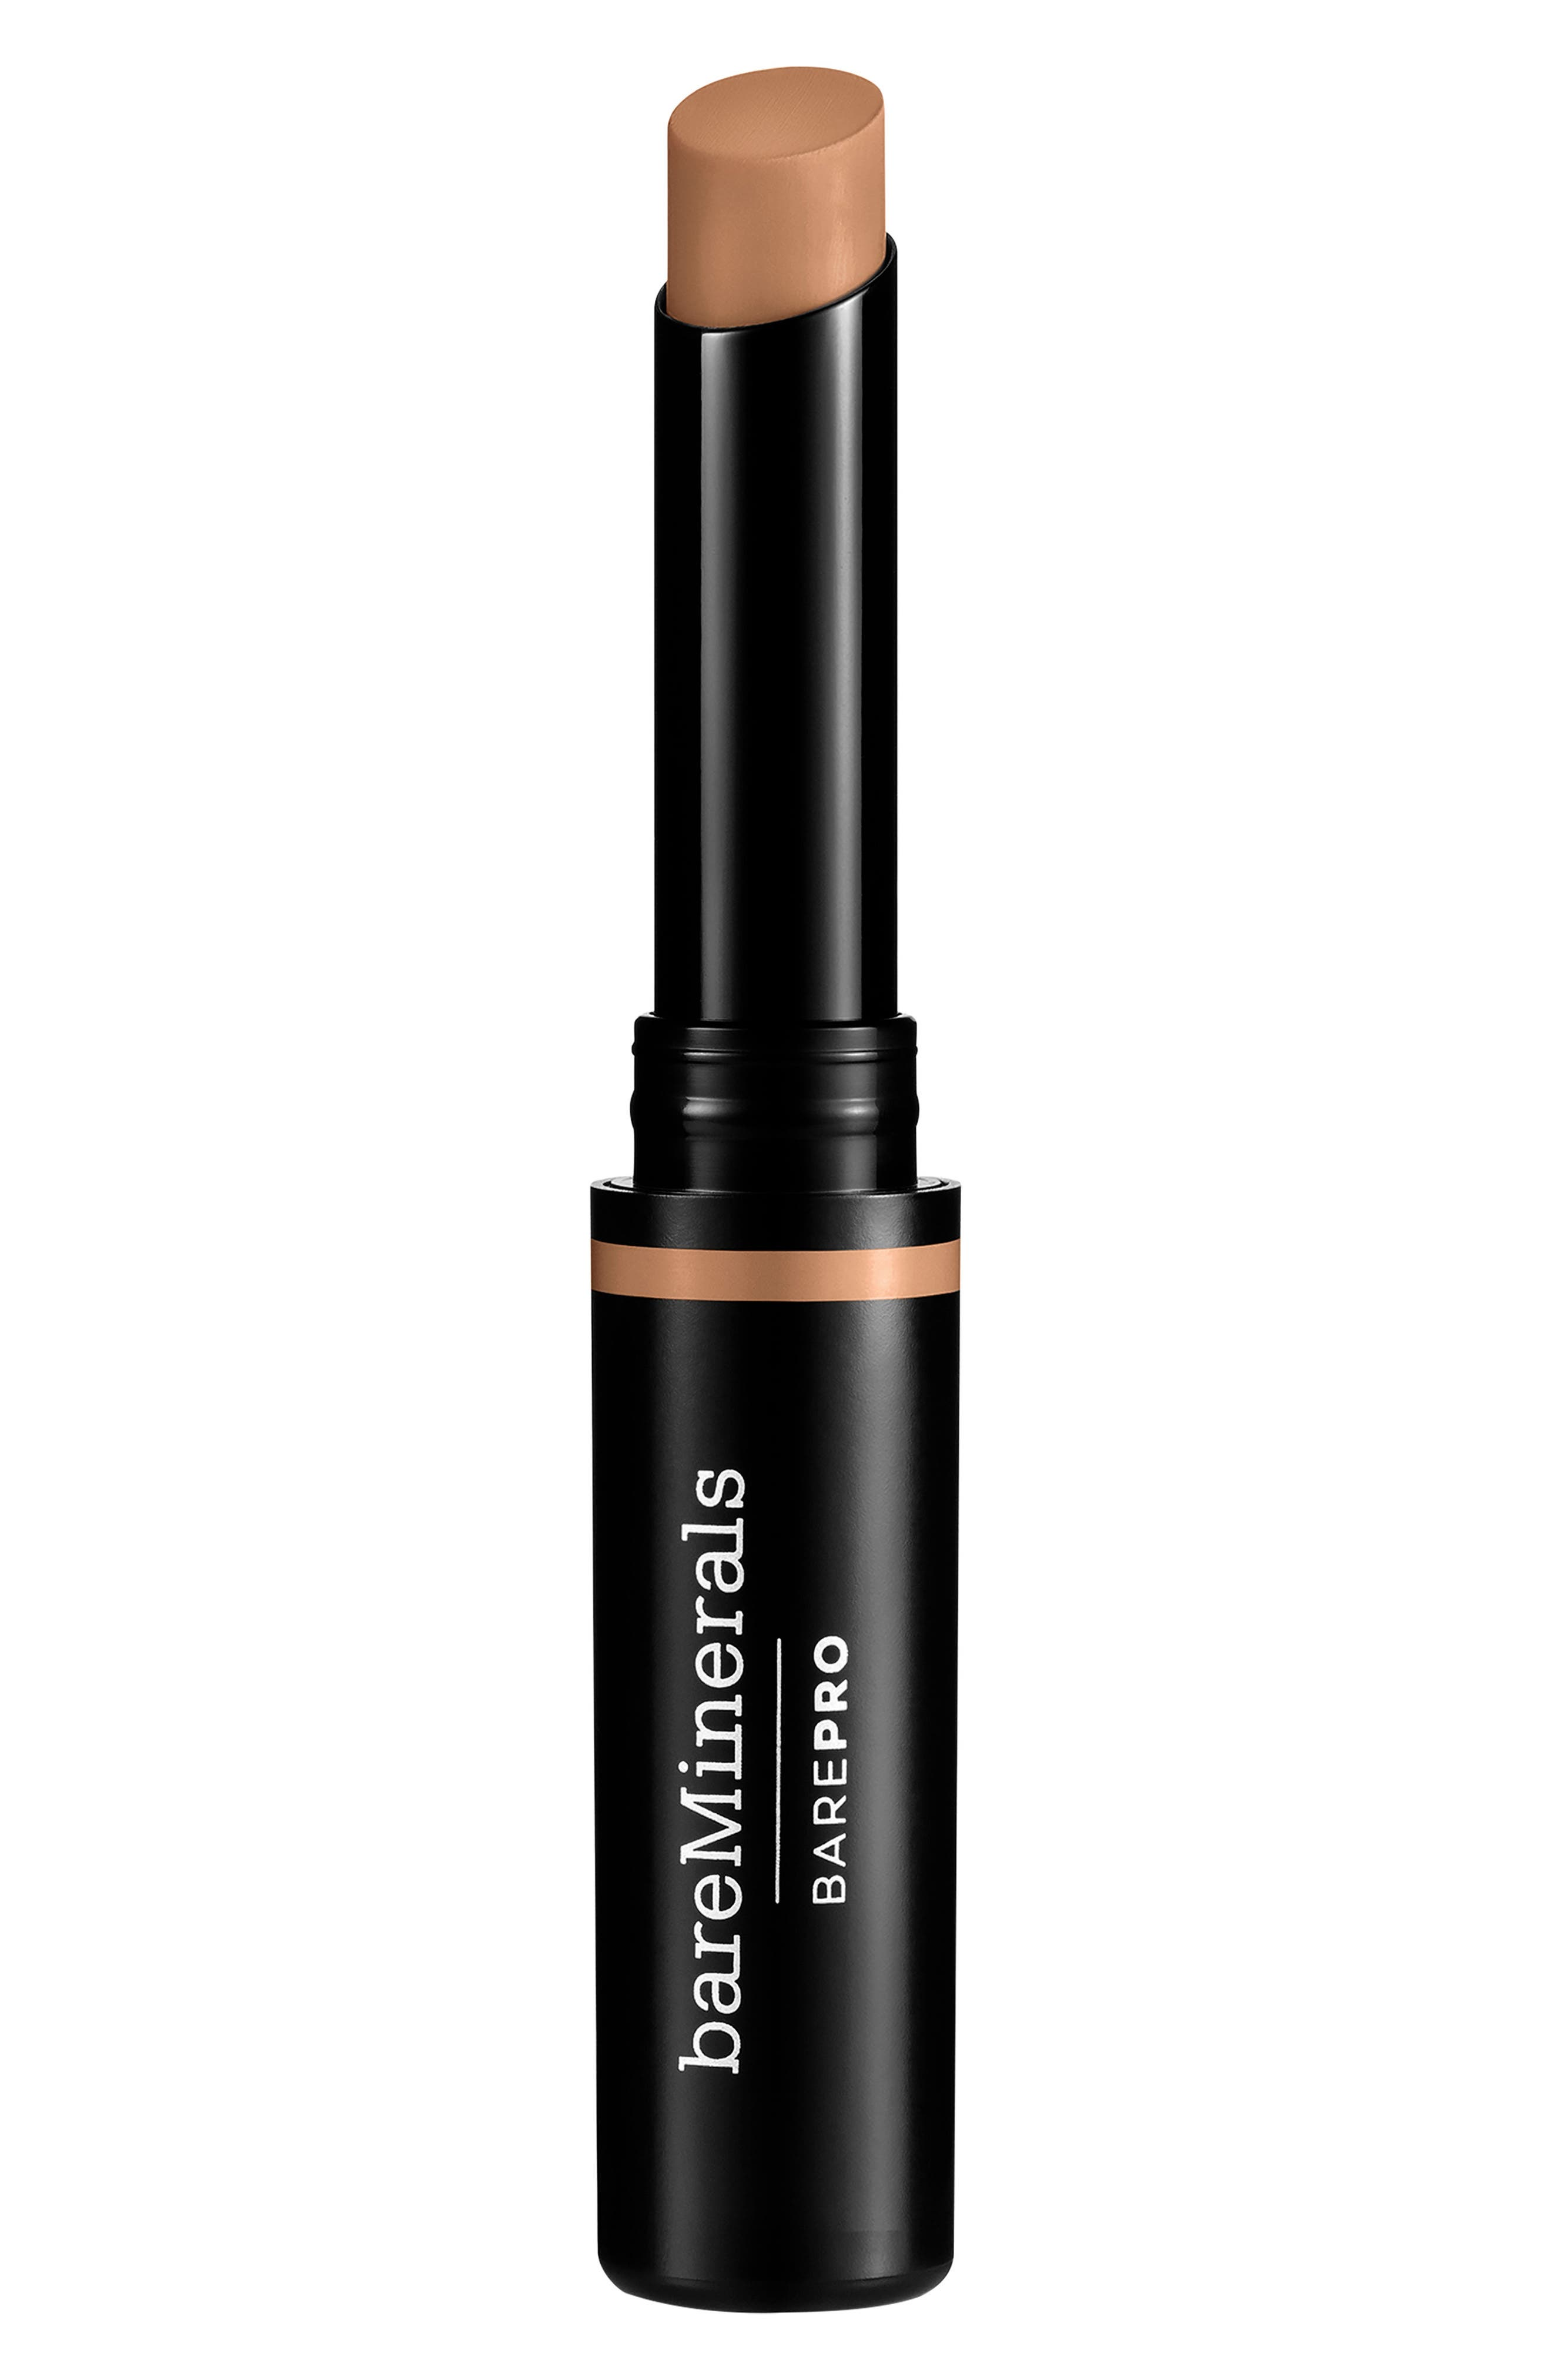 BarePro<sup>®</sup> Stick Concealer,                         Main,                         color, 11 TAN/DARK-WARM